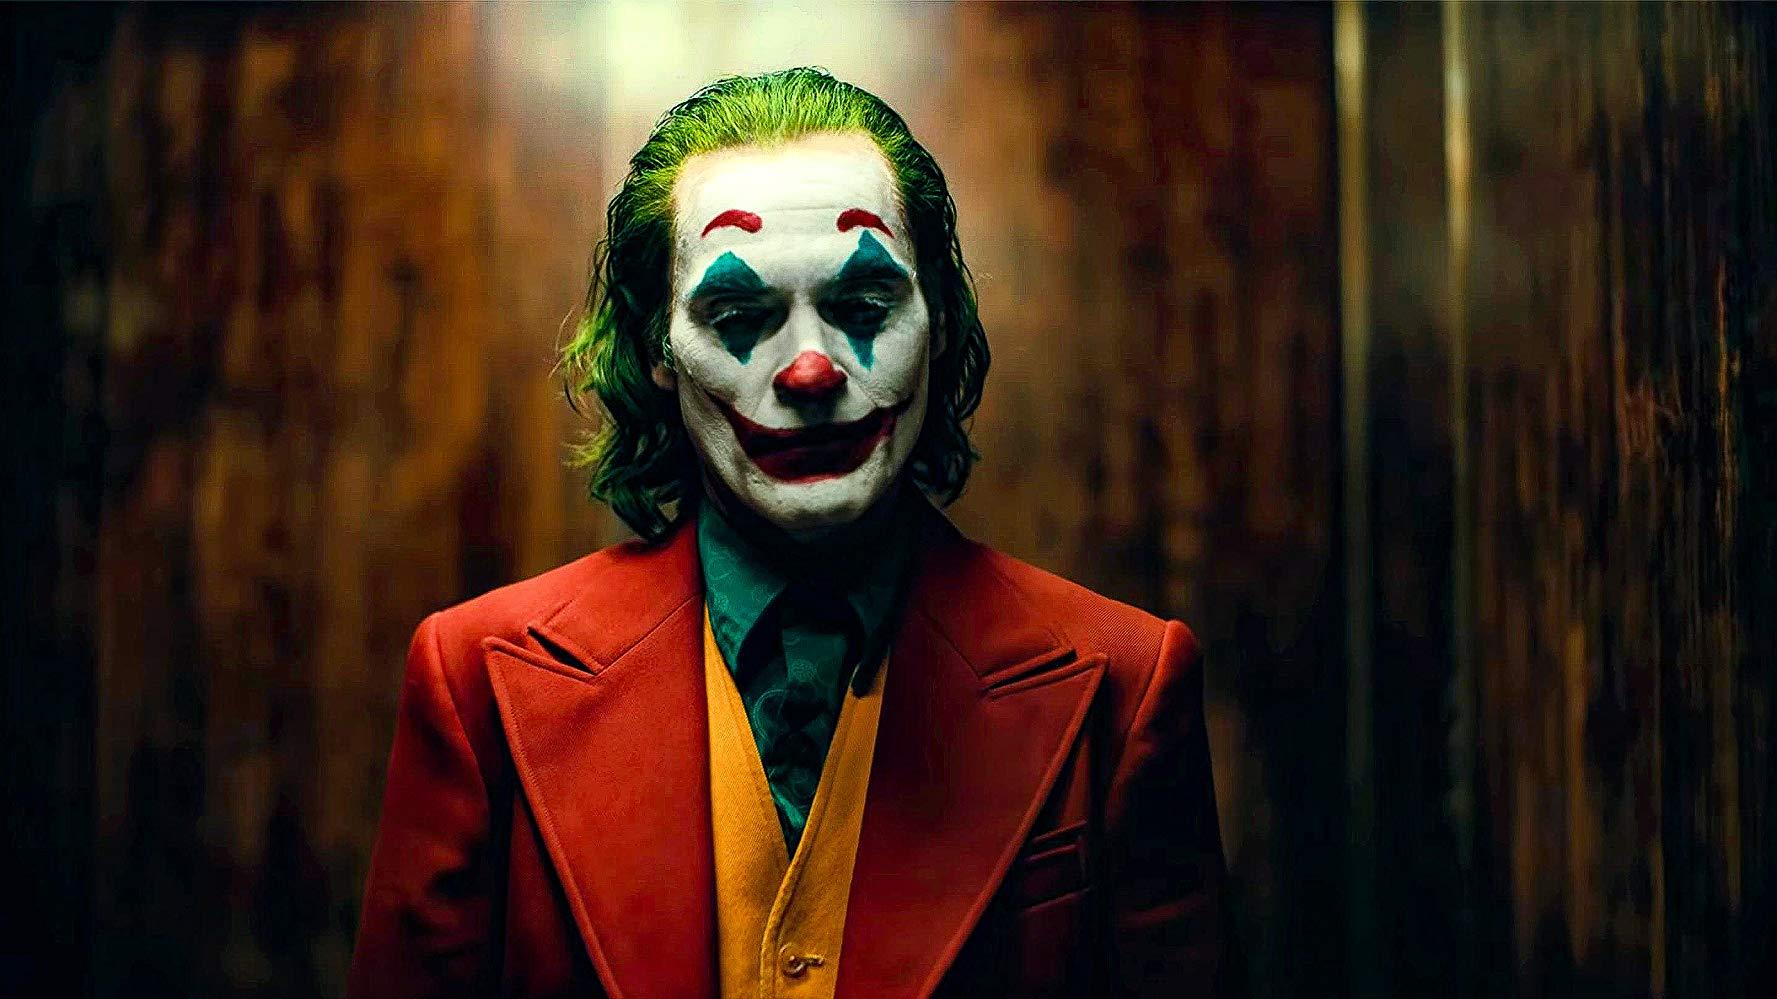 Free Sneak Preview Movie Quot Joker Quot Amc Metreon 16 Sf